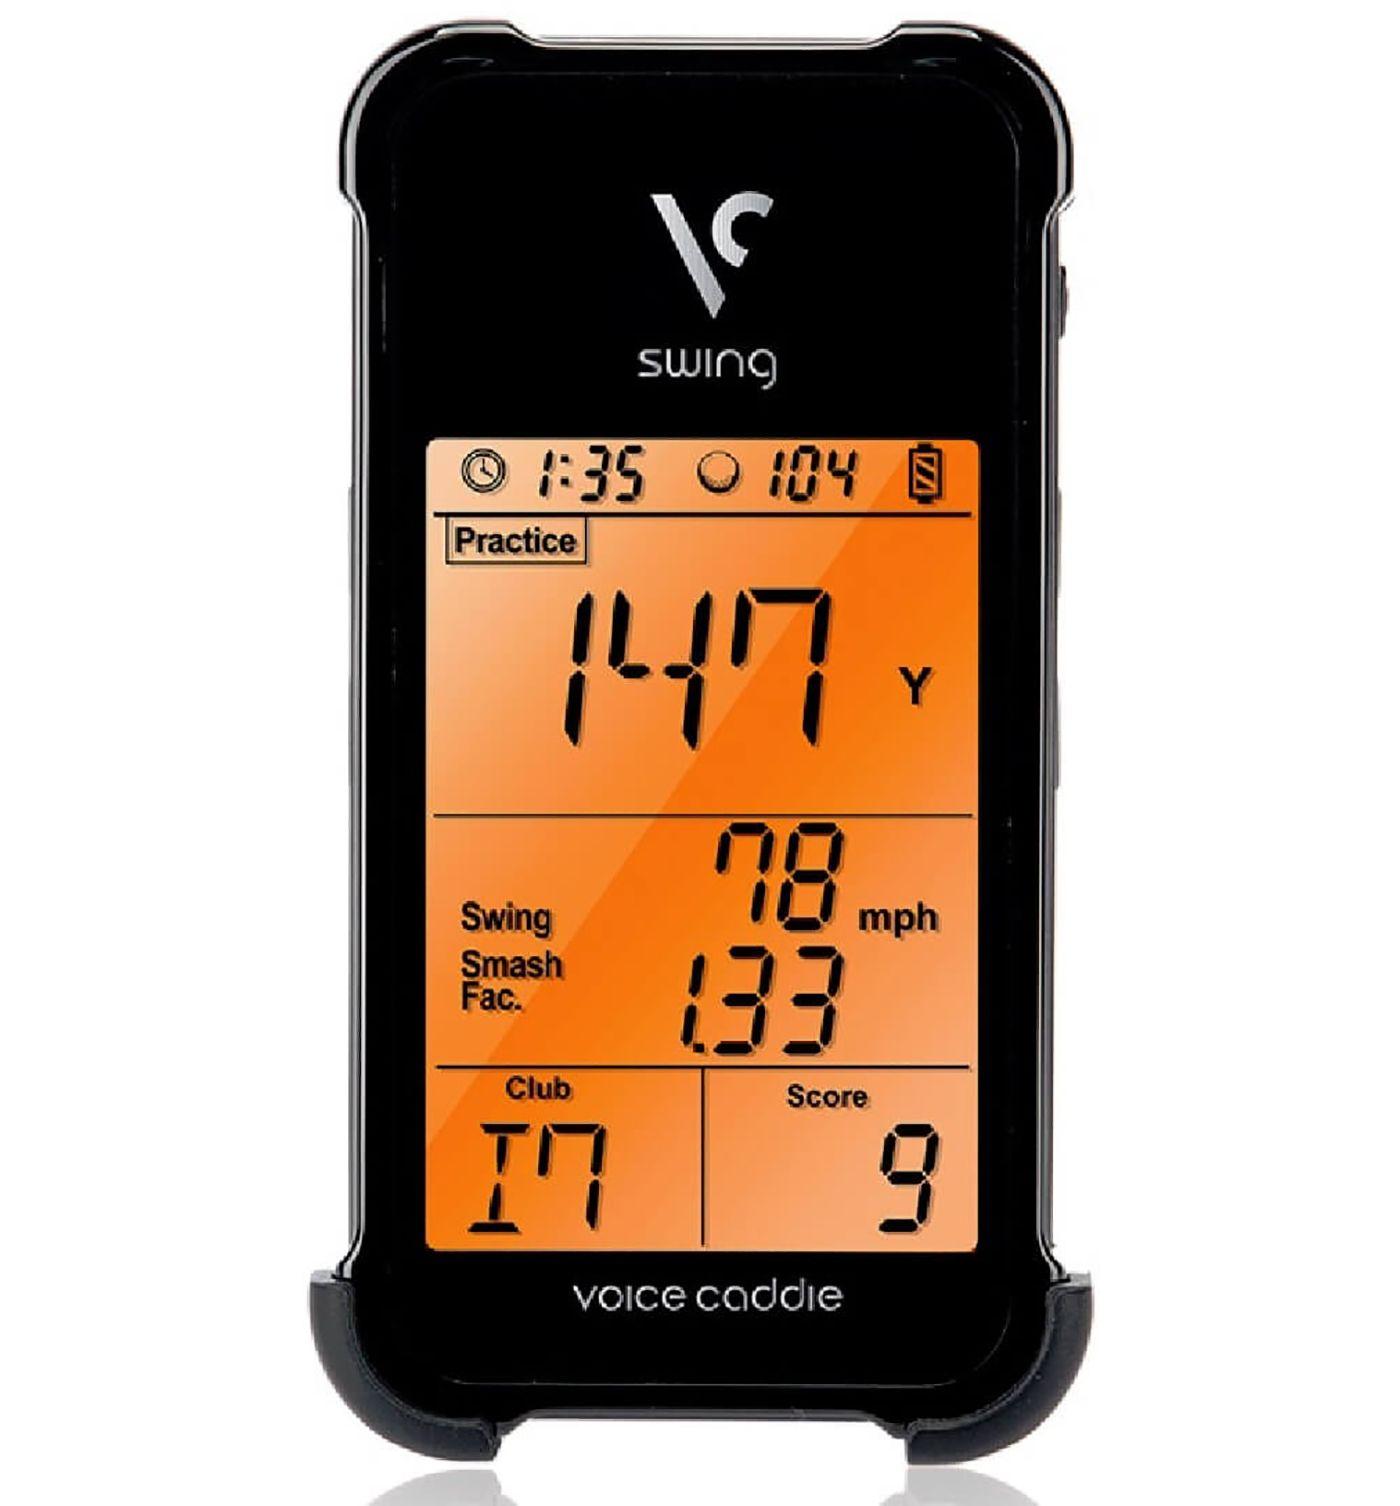 Voice Caddie SC100 Swing Caddie Portable Launch Monitor